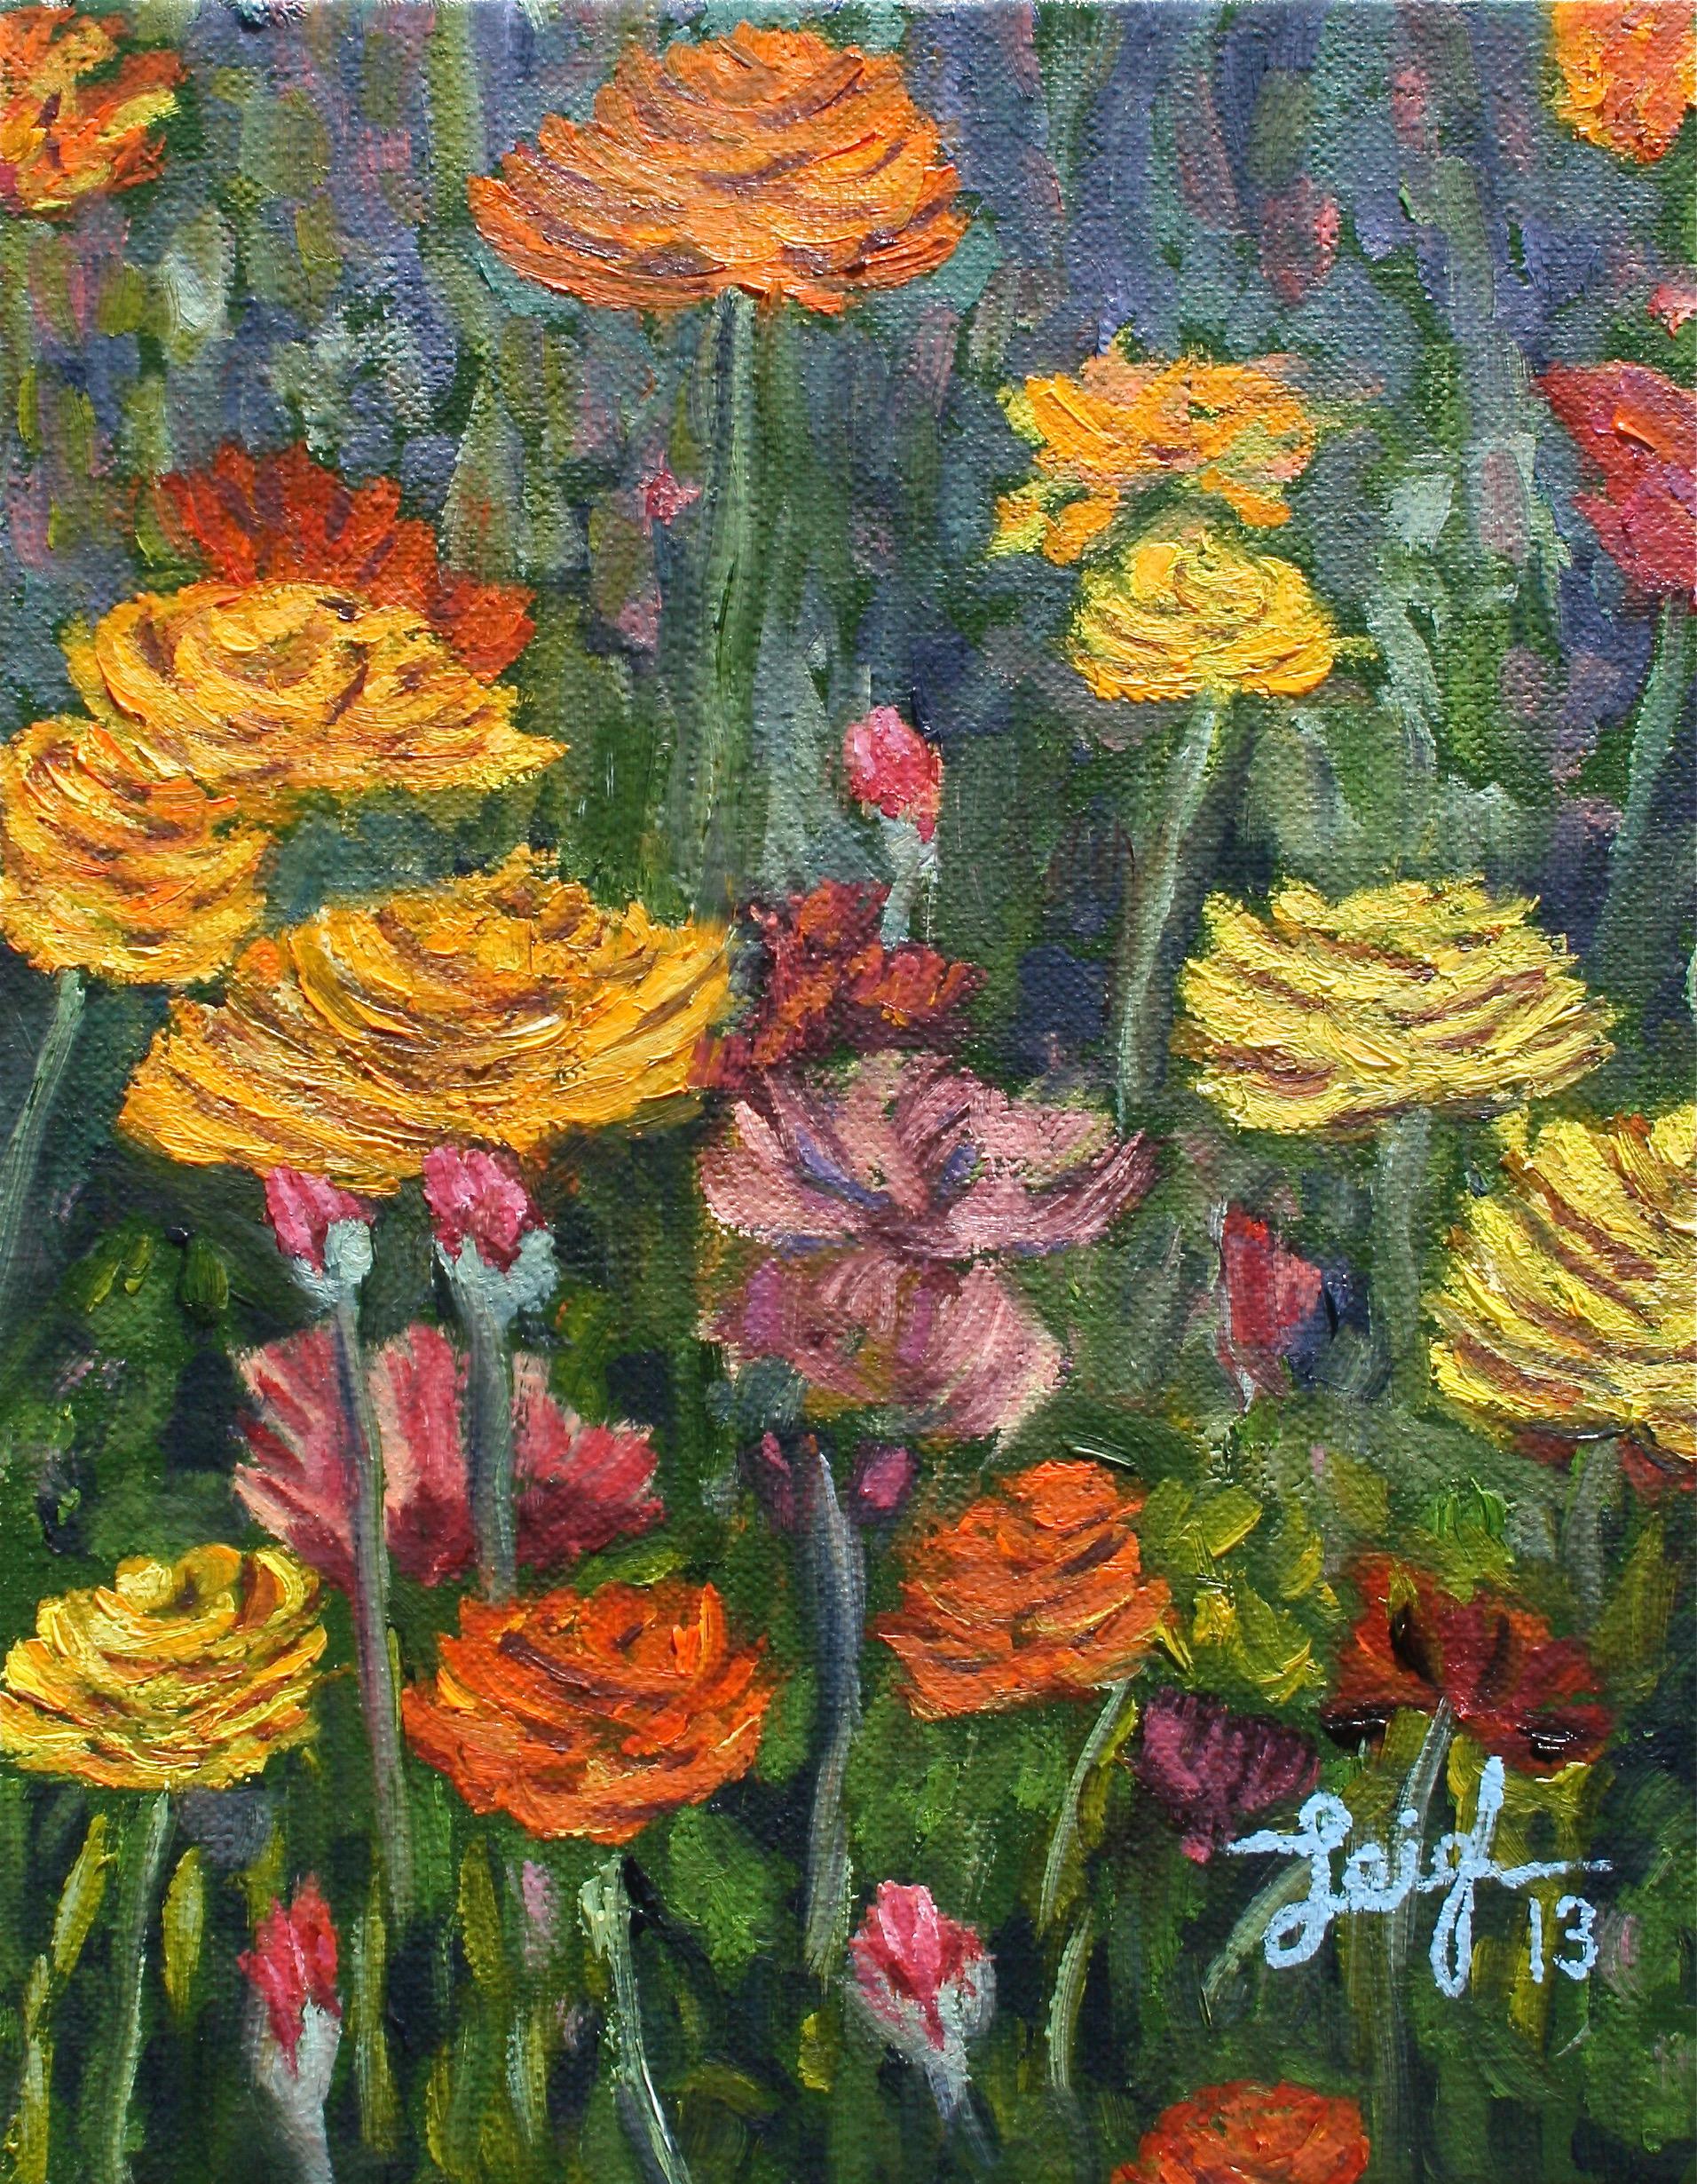 Carlsbad Flower Fields #5  ~   Catherine Cook-Cottone, Buffalo, NY 2013 • 8 x 10